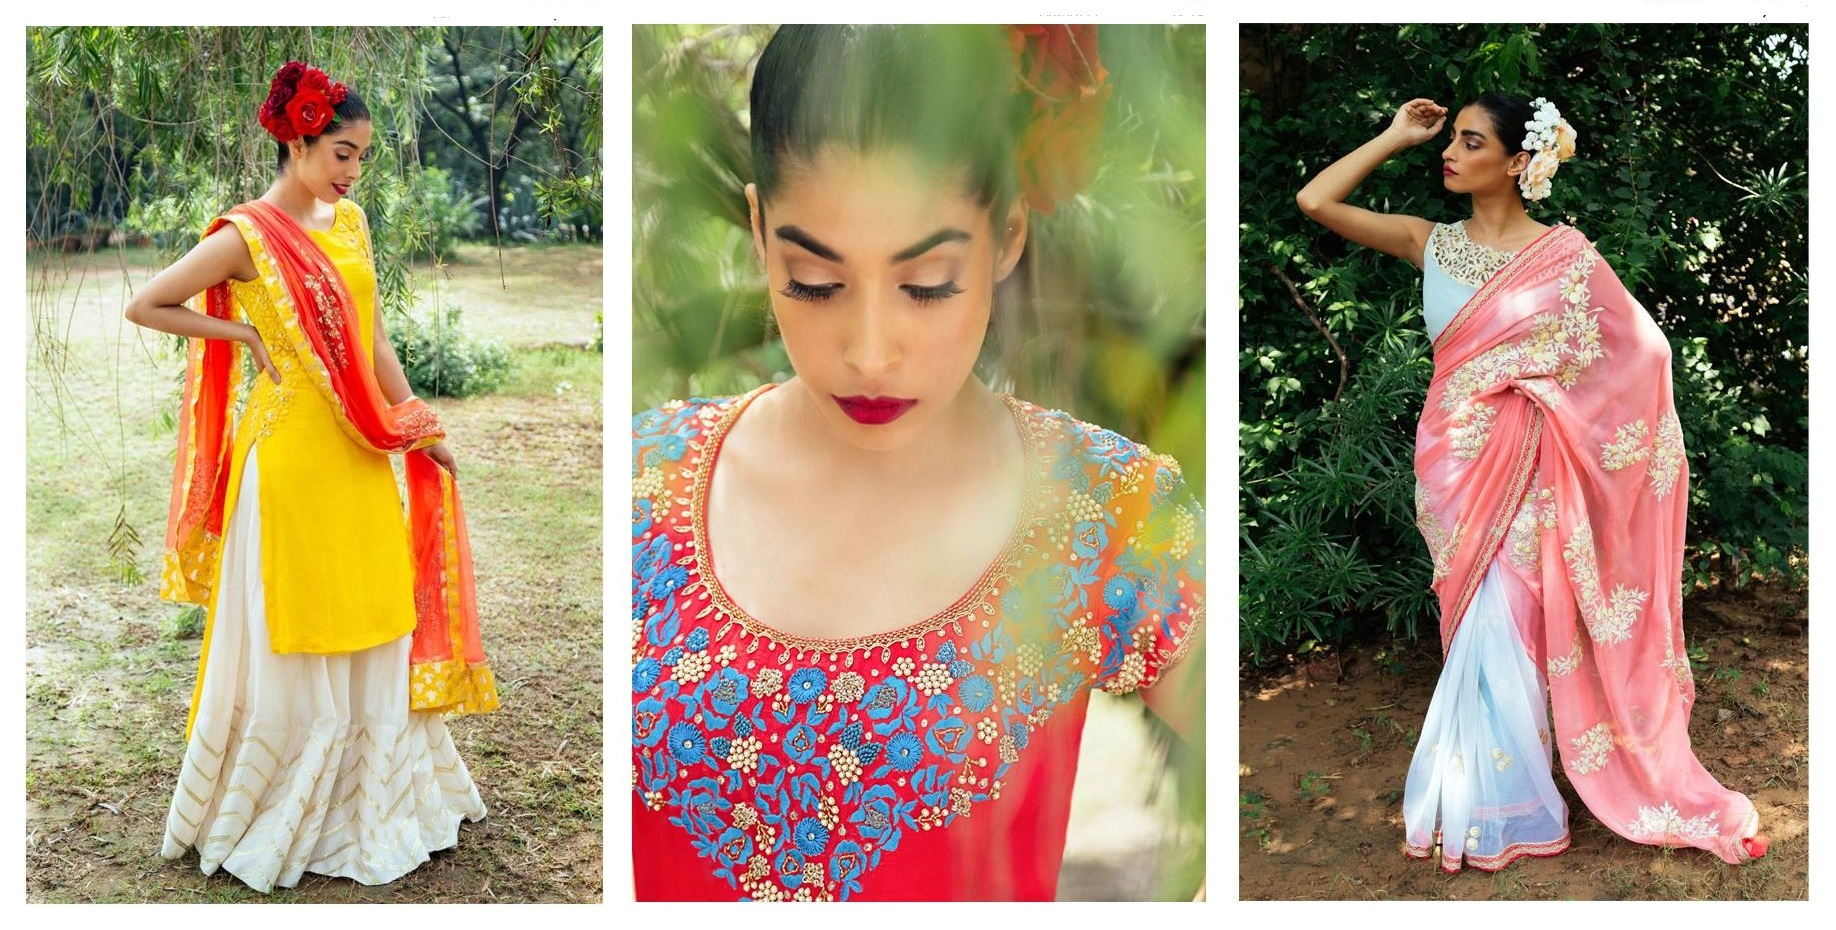 amritathakur_bridalwear_fashion_style